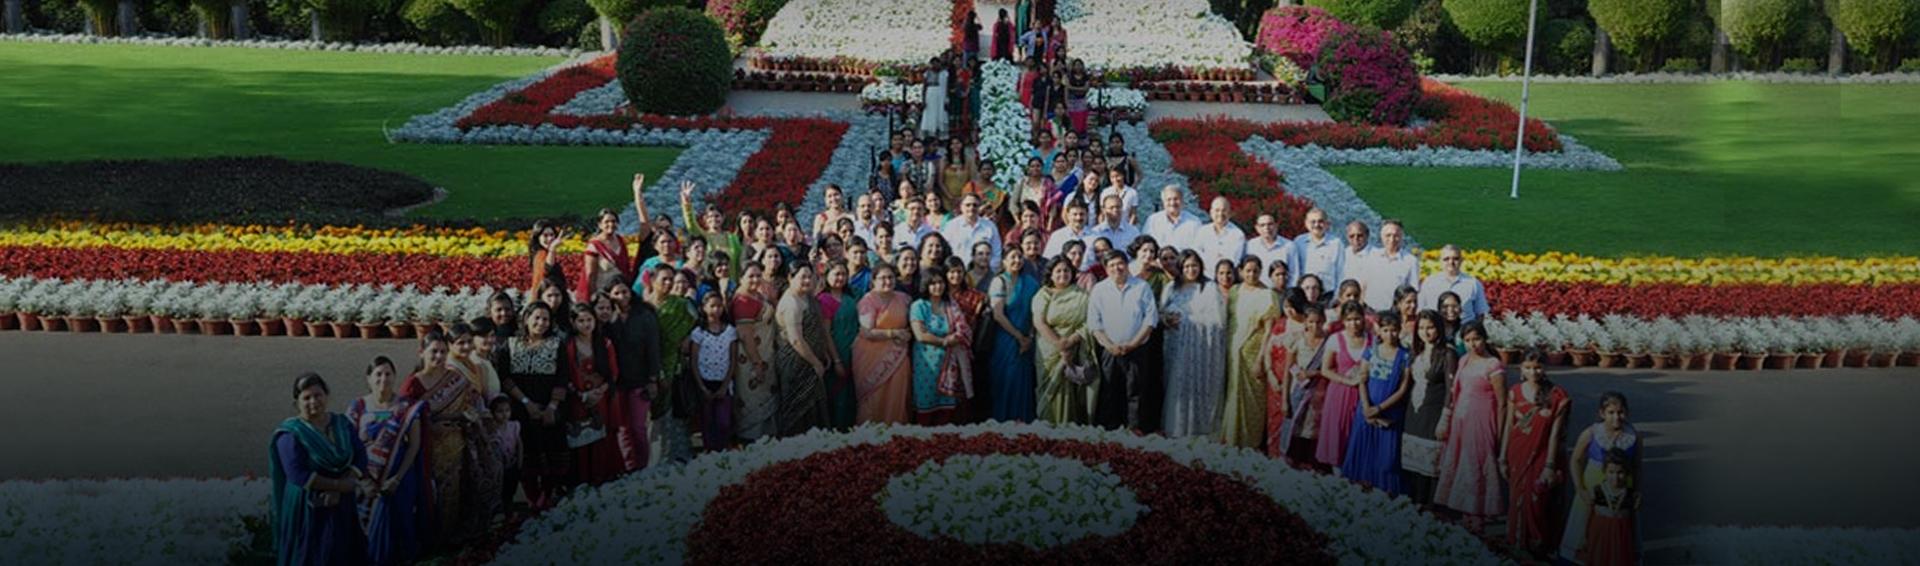 Diversity and Inclusion - Tata Motors